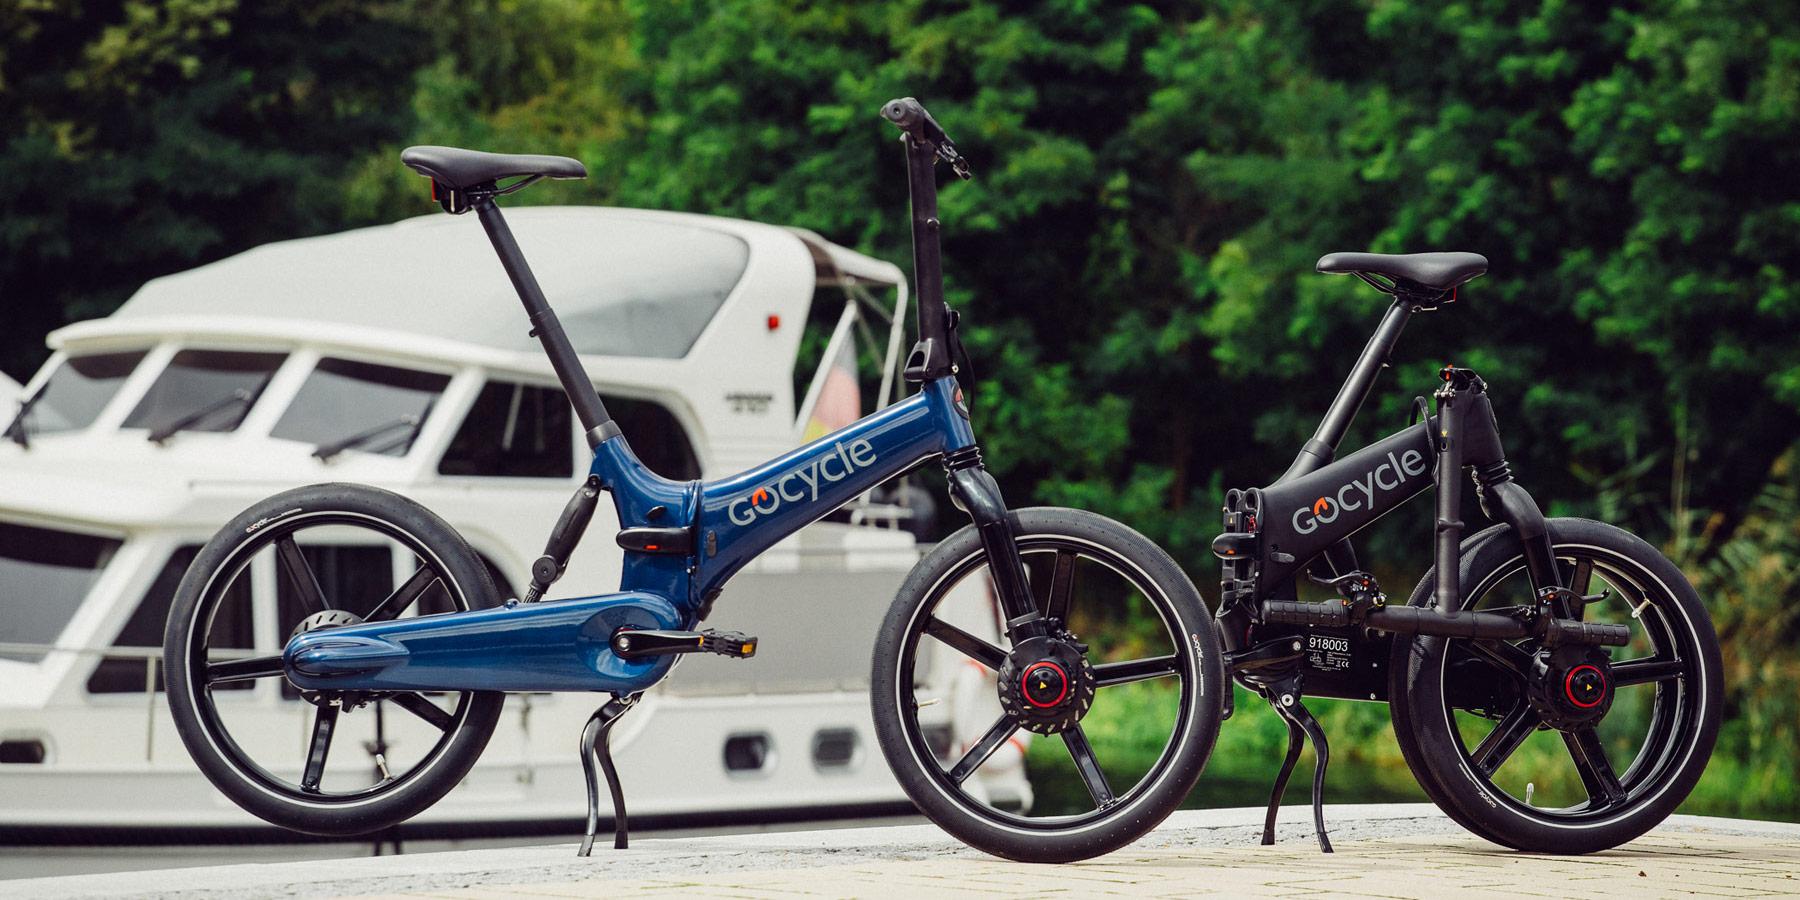 Gocycle GX Aktion - 2899 €